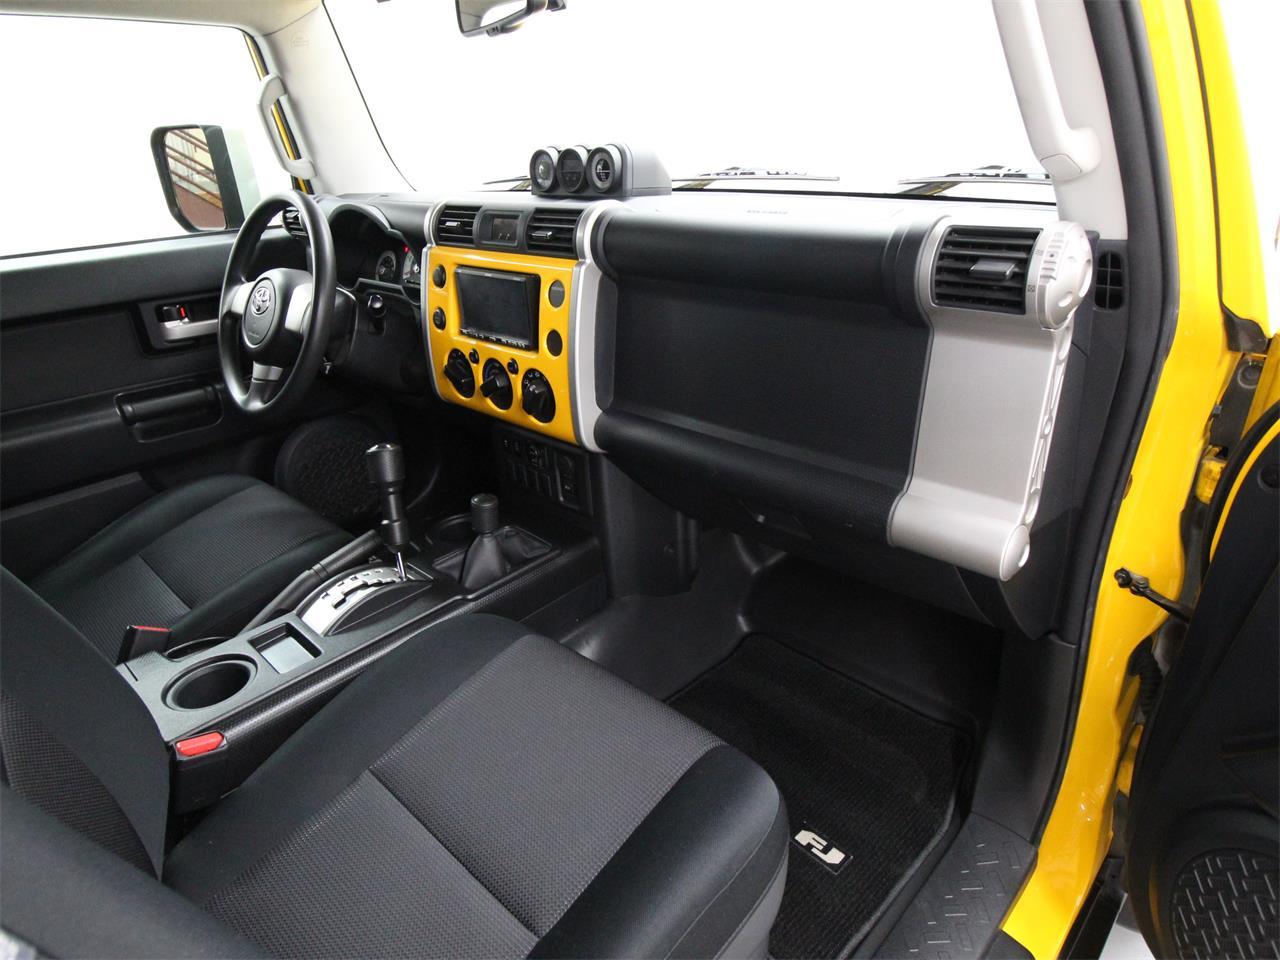 2010 Toyota FJ Cruiser (CC-1221935) for sale in Christiansburg, Virginia